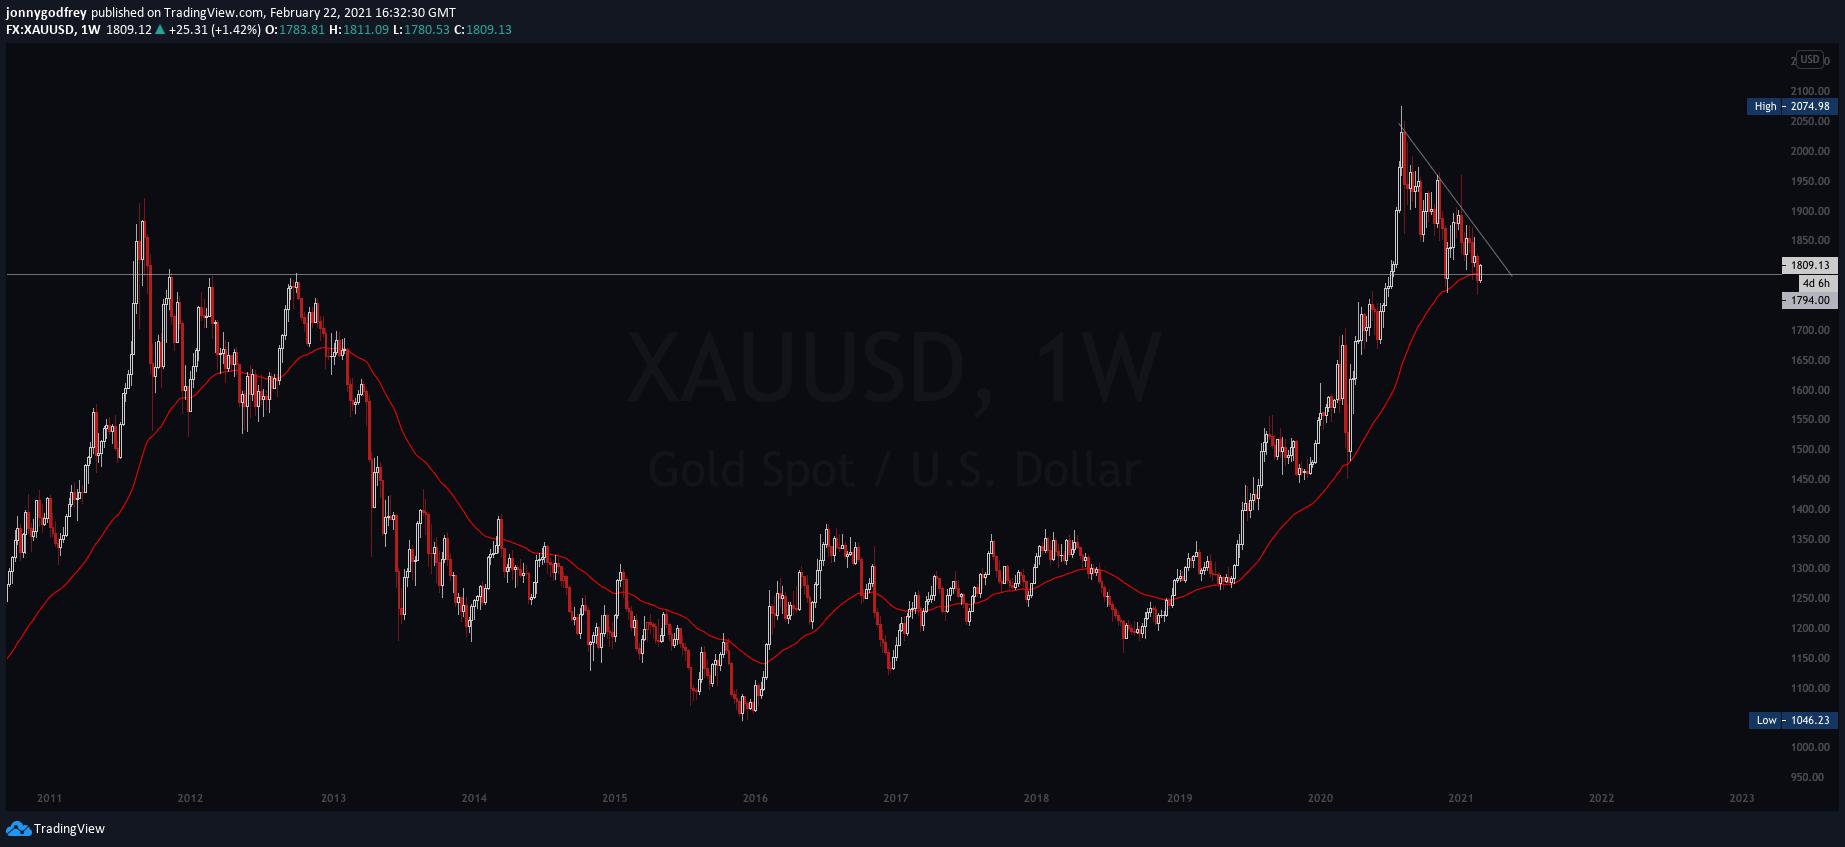 XAUUSD weekly chart